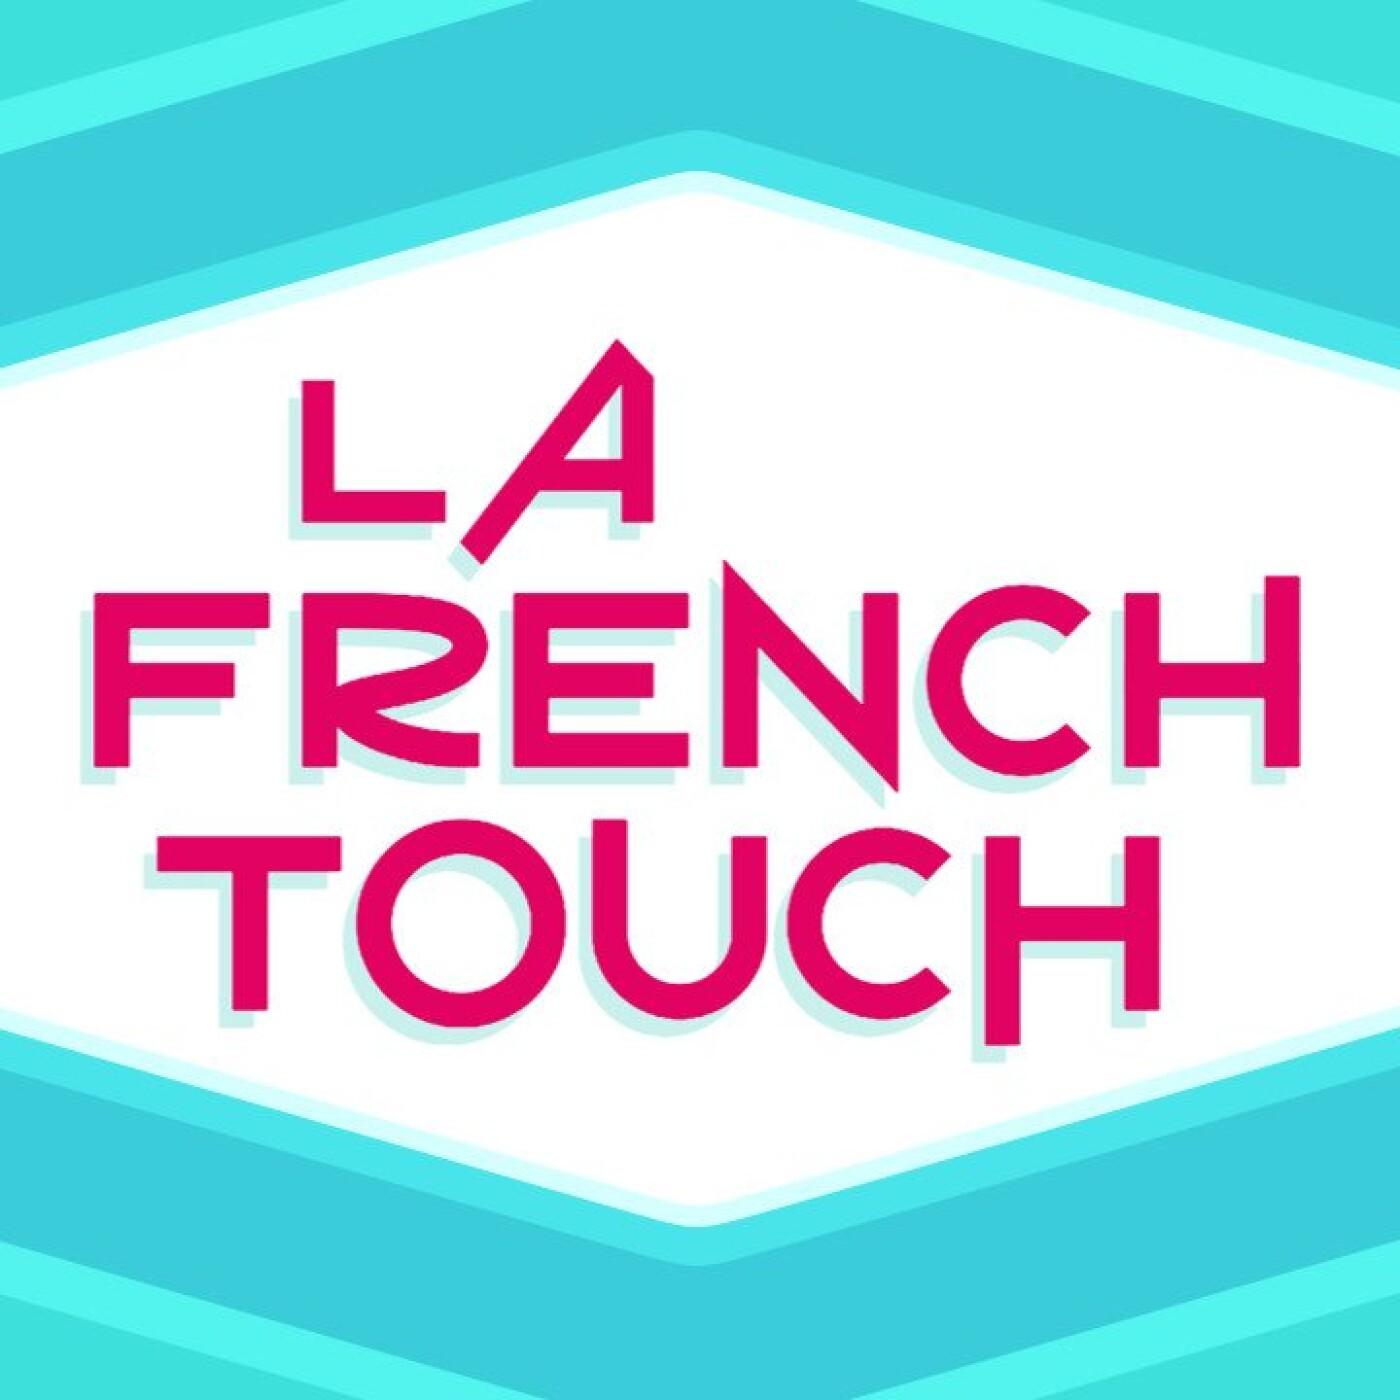 Loic Henrio parle de la French Touch et de Icube - 10 03 2021 - StereoChic Radio